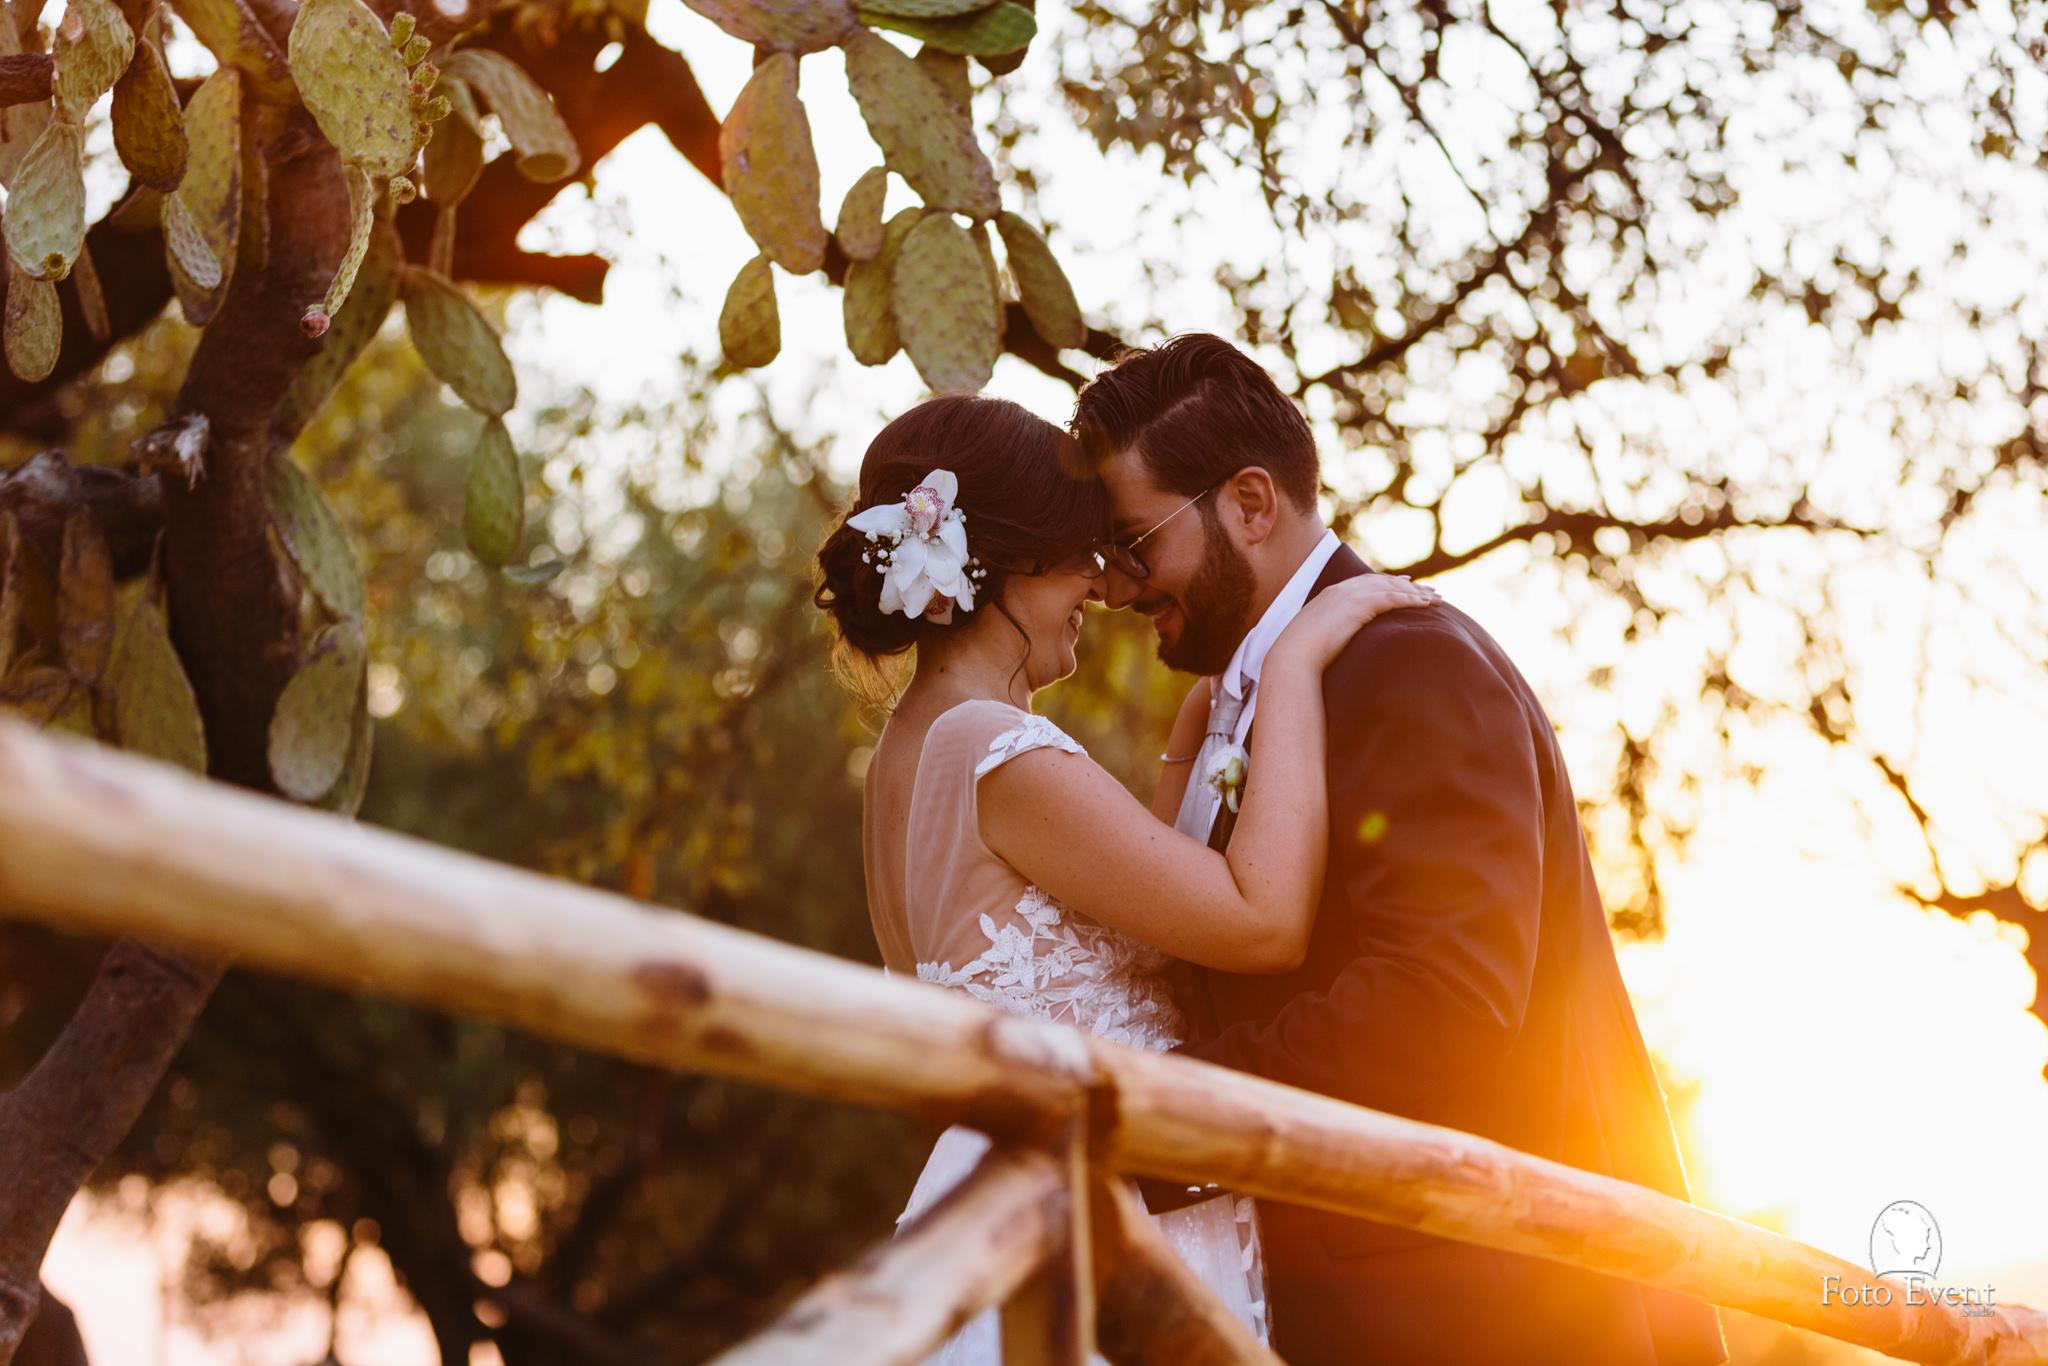 035-2019-09-09-Matrimonio-Dorotea-e-Alberto-Iemmolo-zoom-605